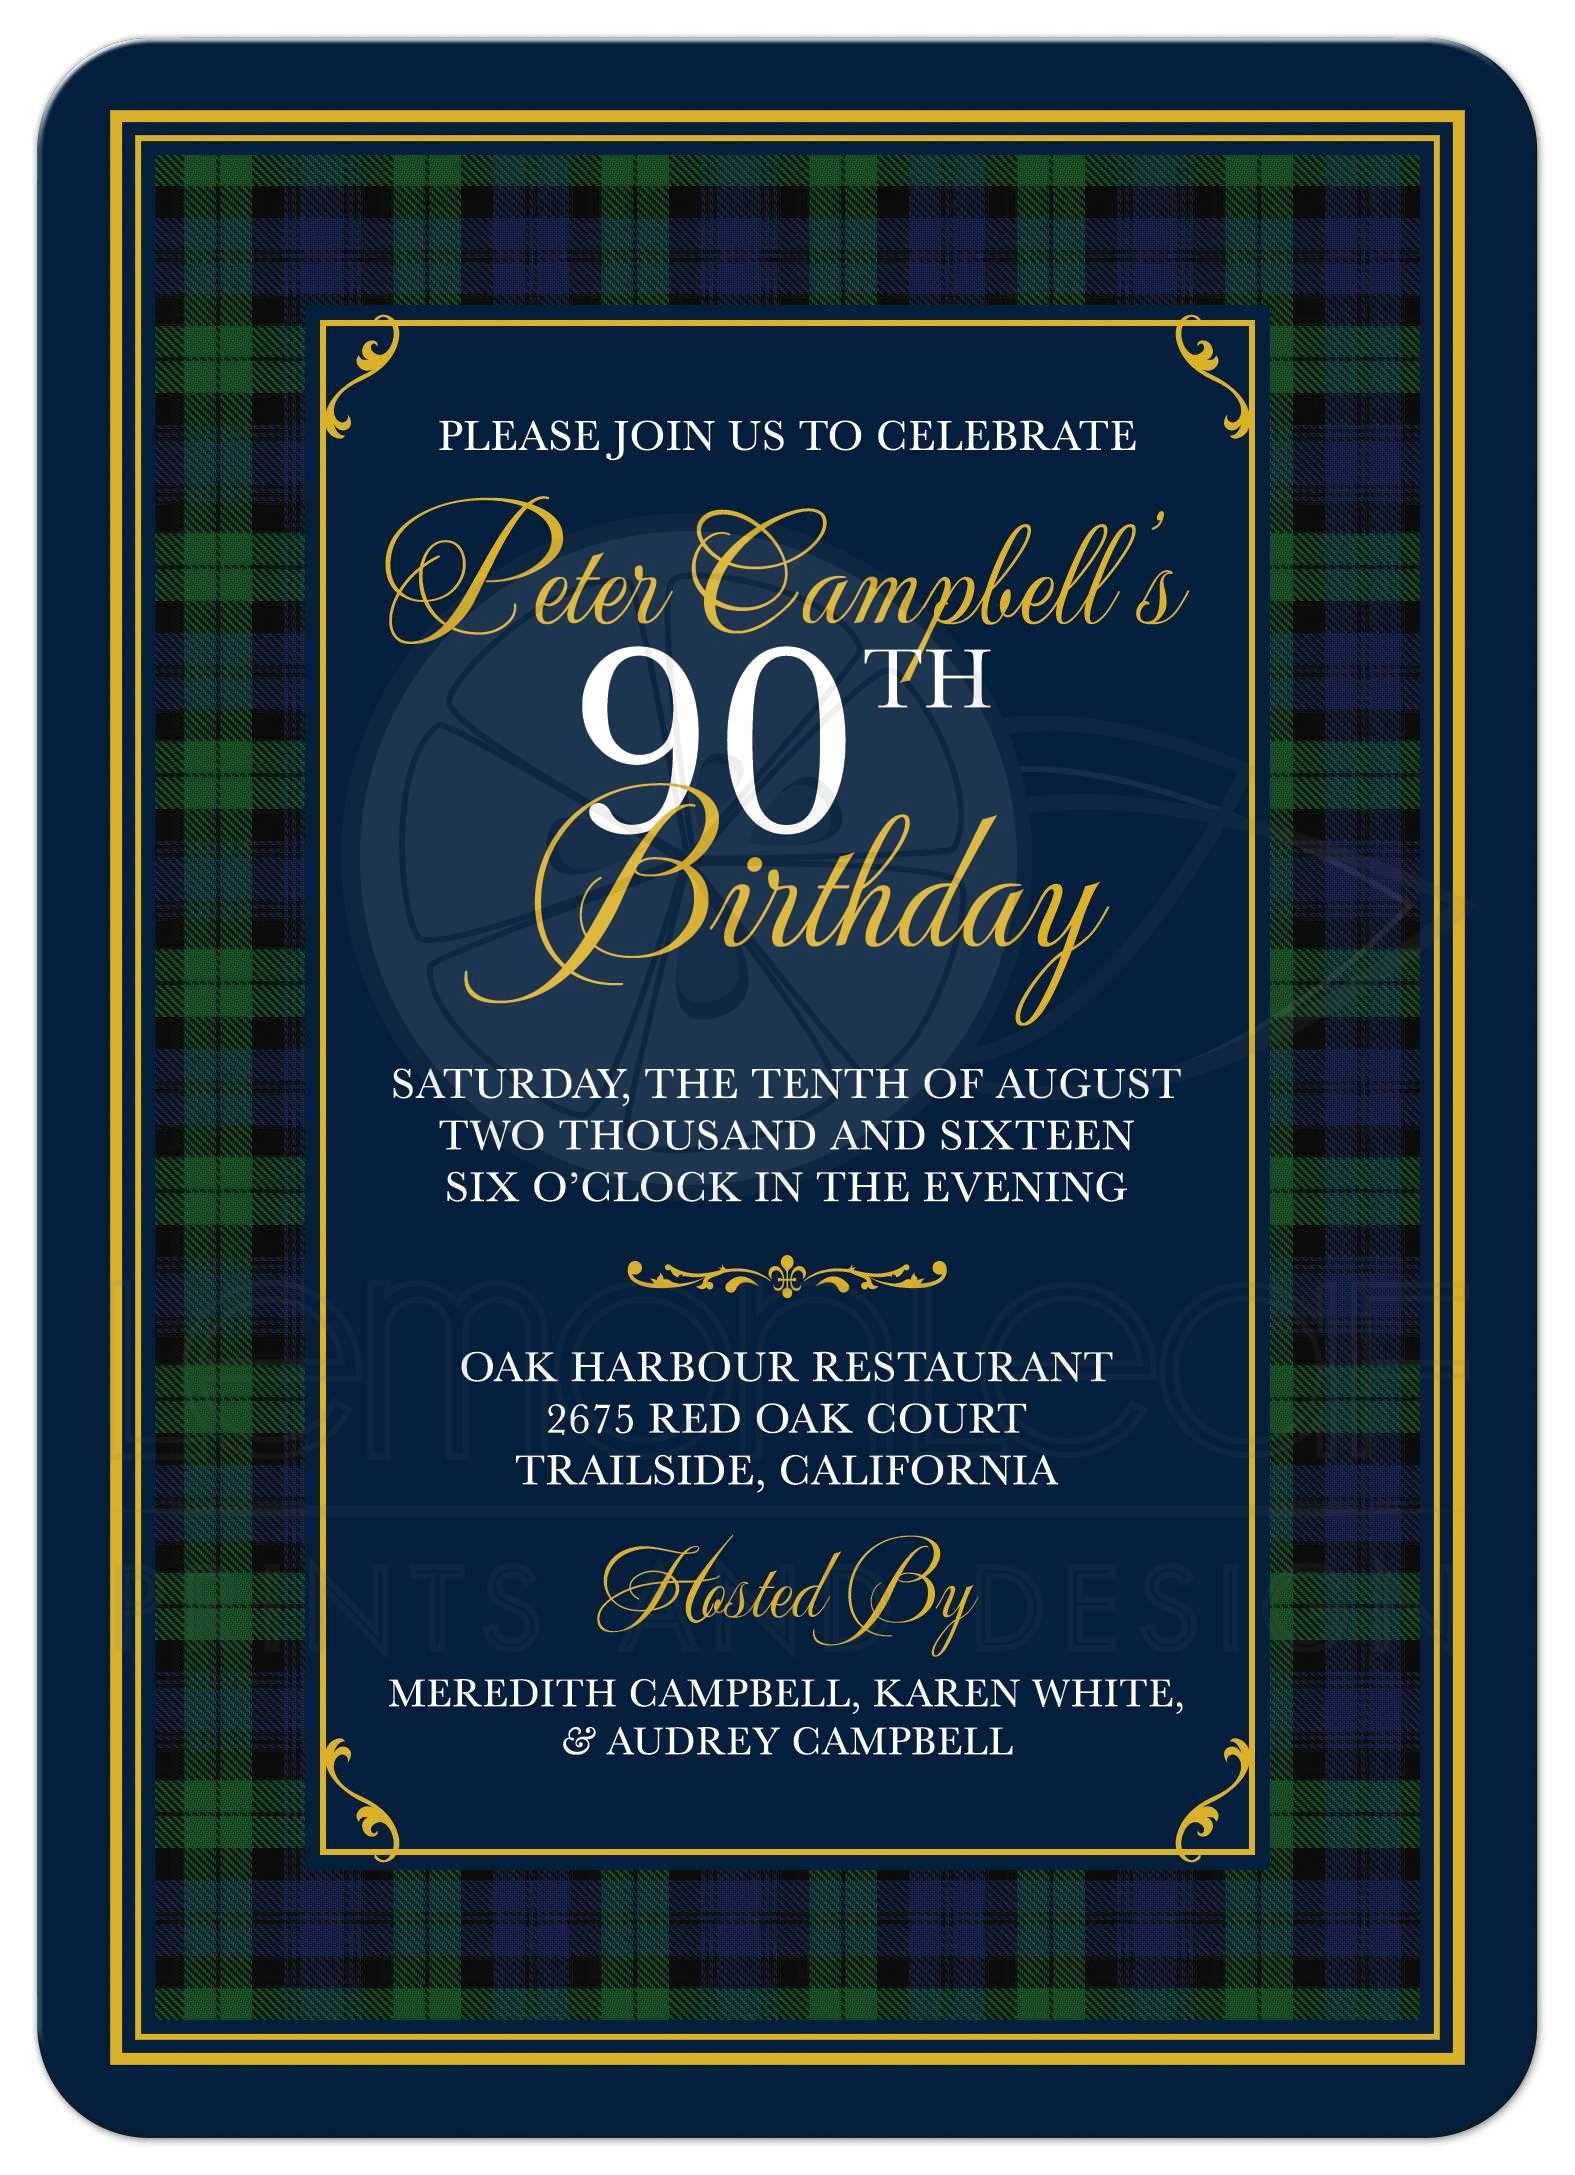 Black watch or campbell tartan 90th birthday invitation scottish scottish black watch tartan or campbell clan tartan 90th birthday invitation front filmwisefo Choice Image